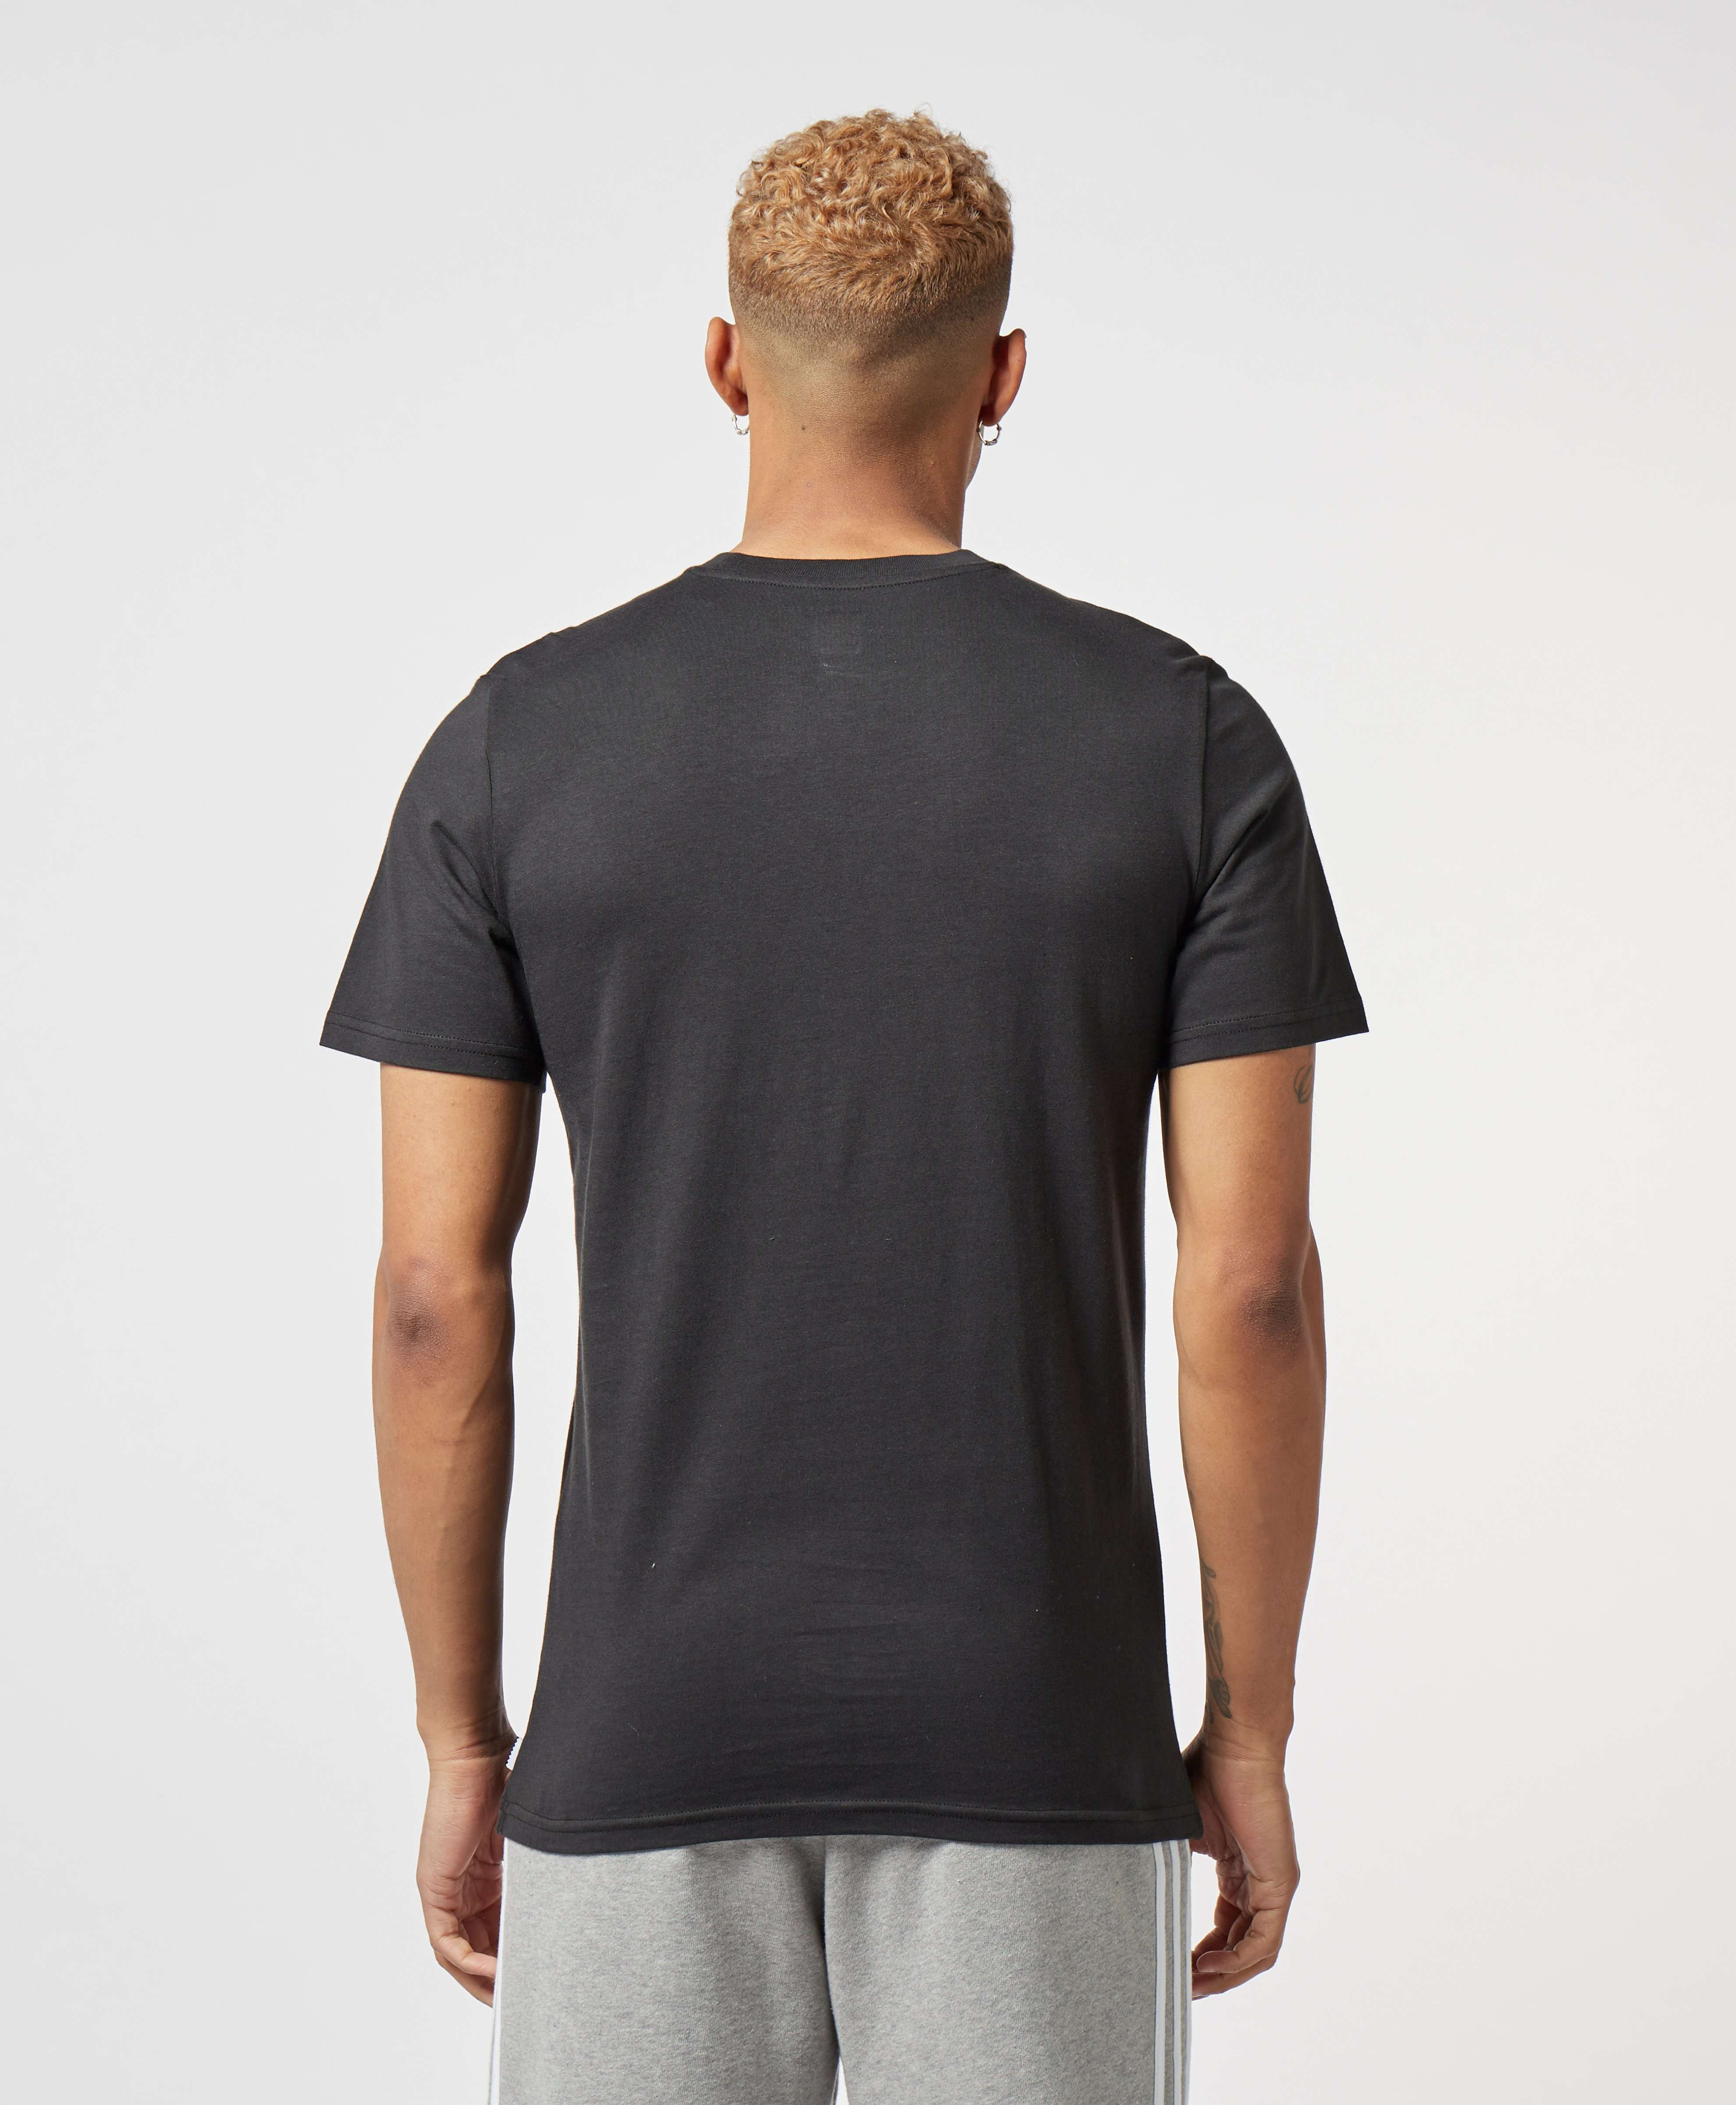 adidas Originals Thaxter Short Sleeve T-Shirt - Online Exclusive